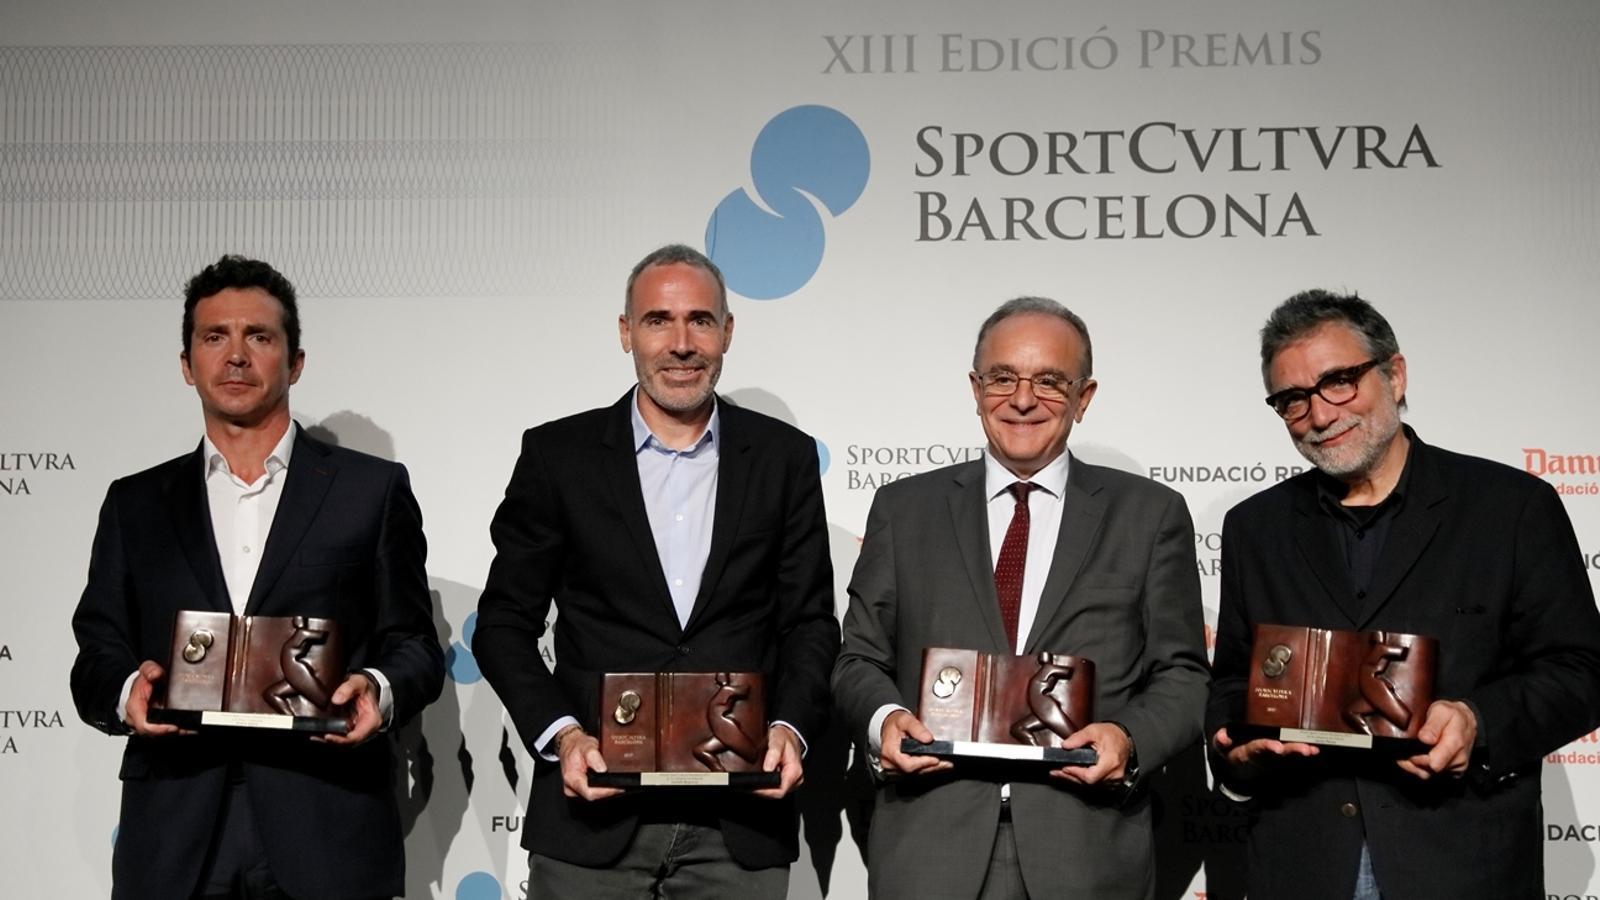 Guillermo Amor, Aleix Corretja, Manel del Castillo i Jaume Plensa